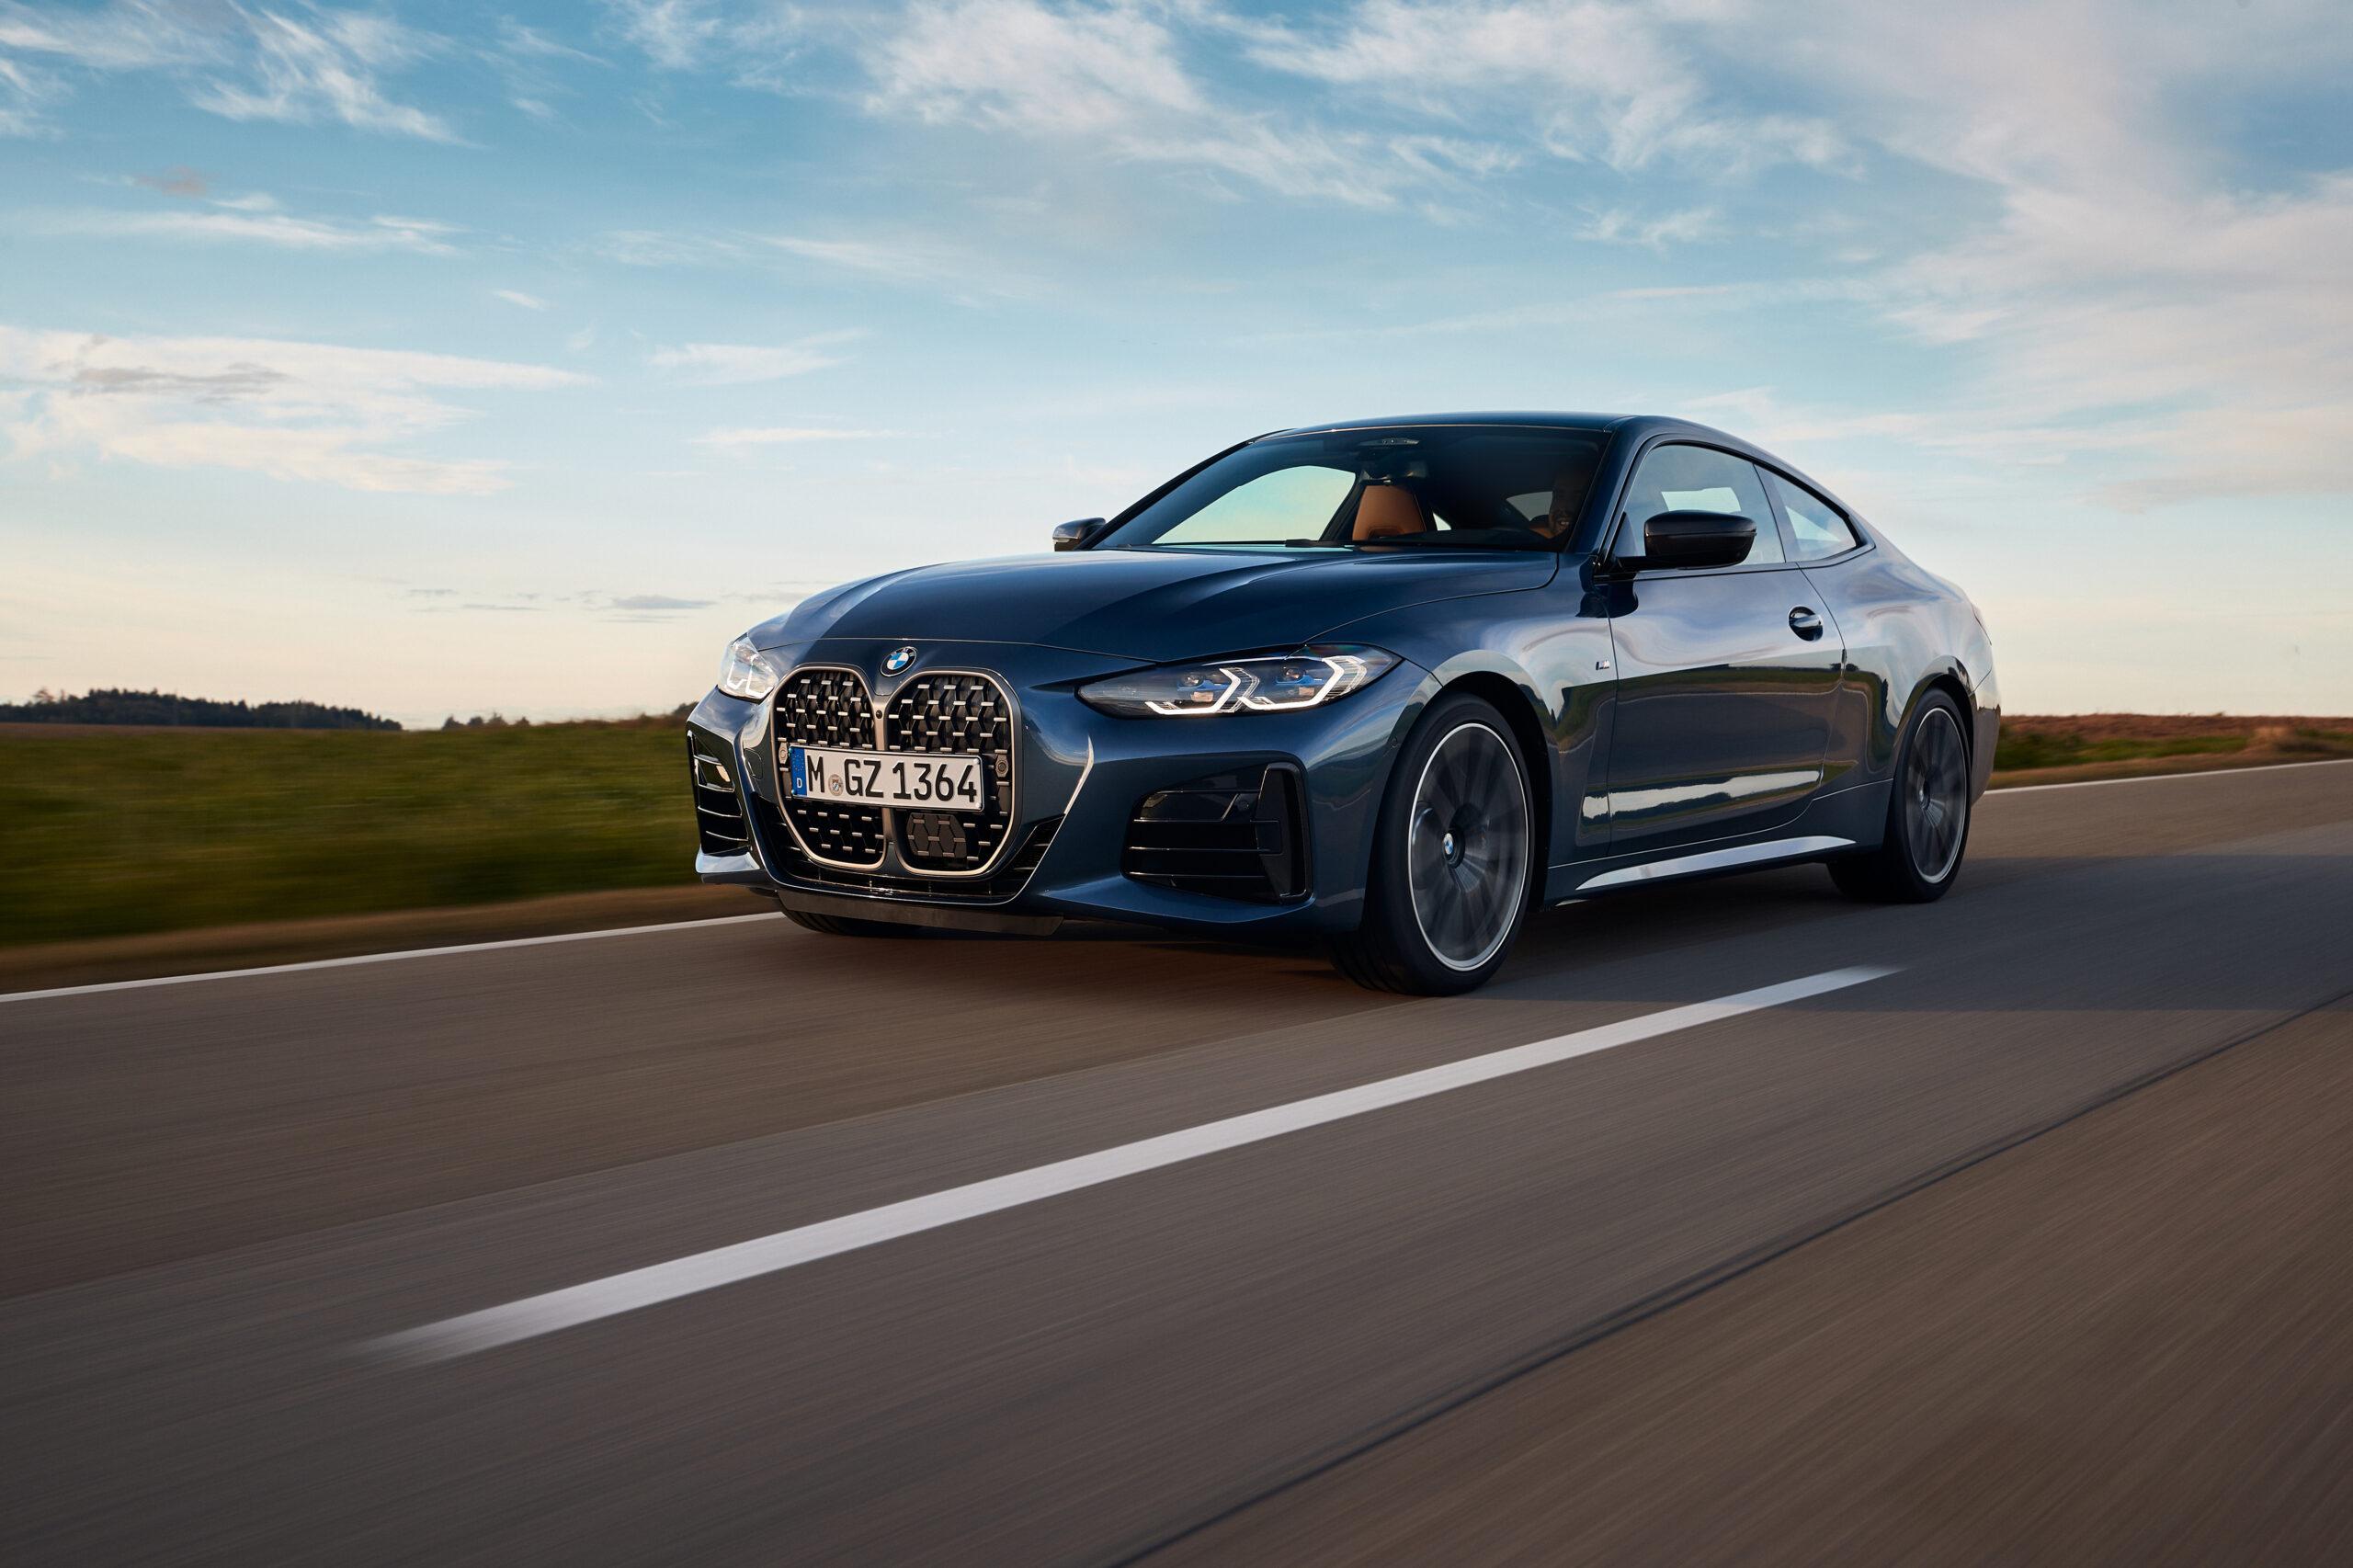 BMW serii 4 Coupé